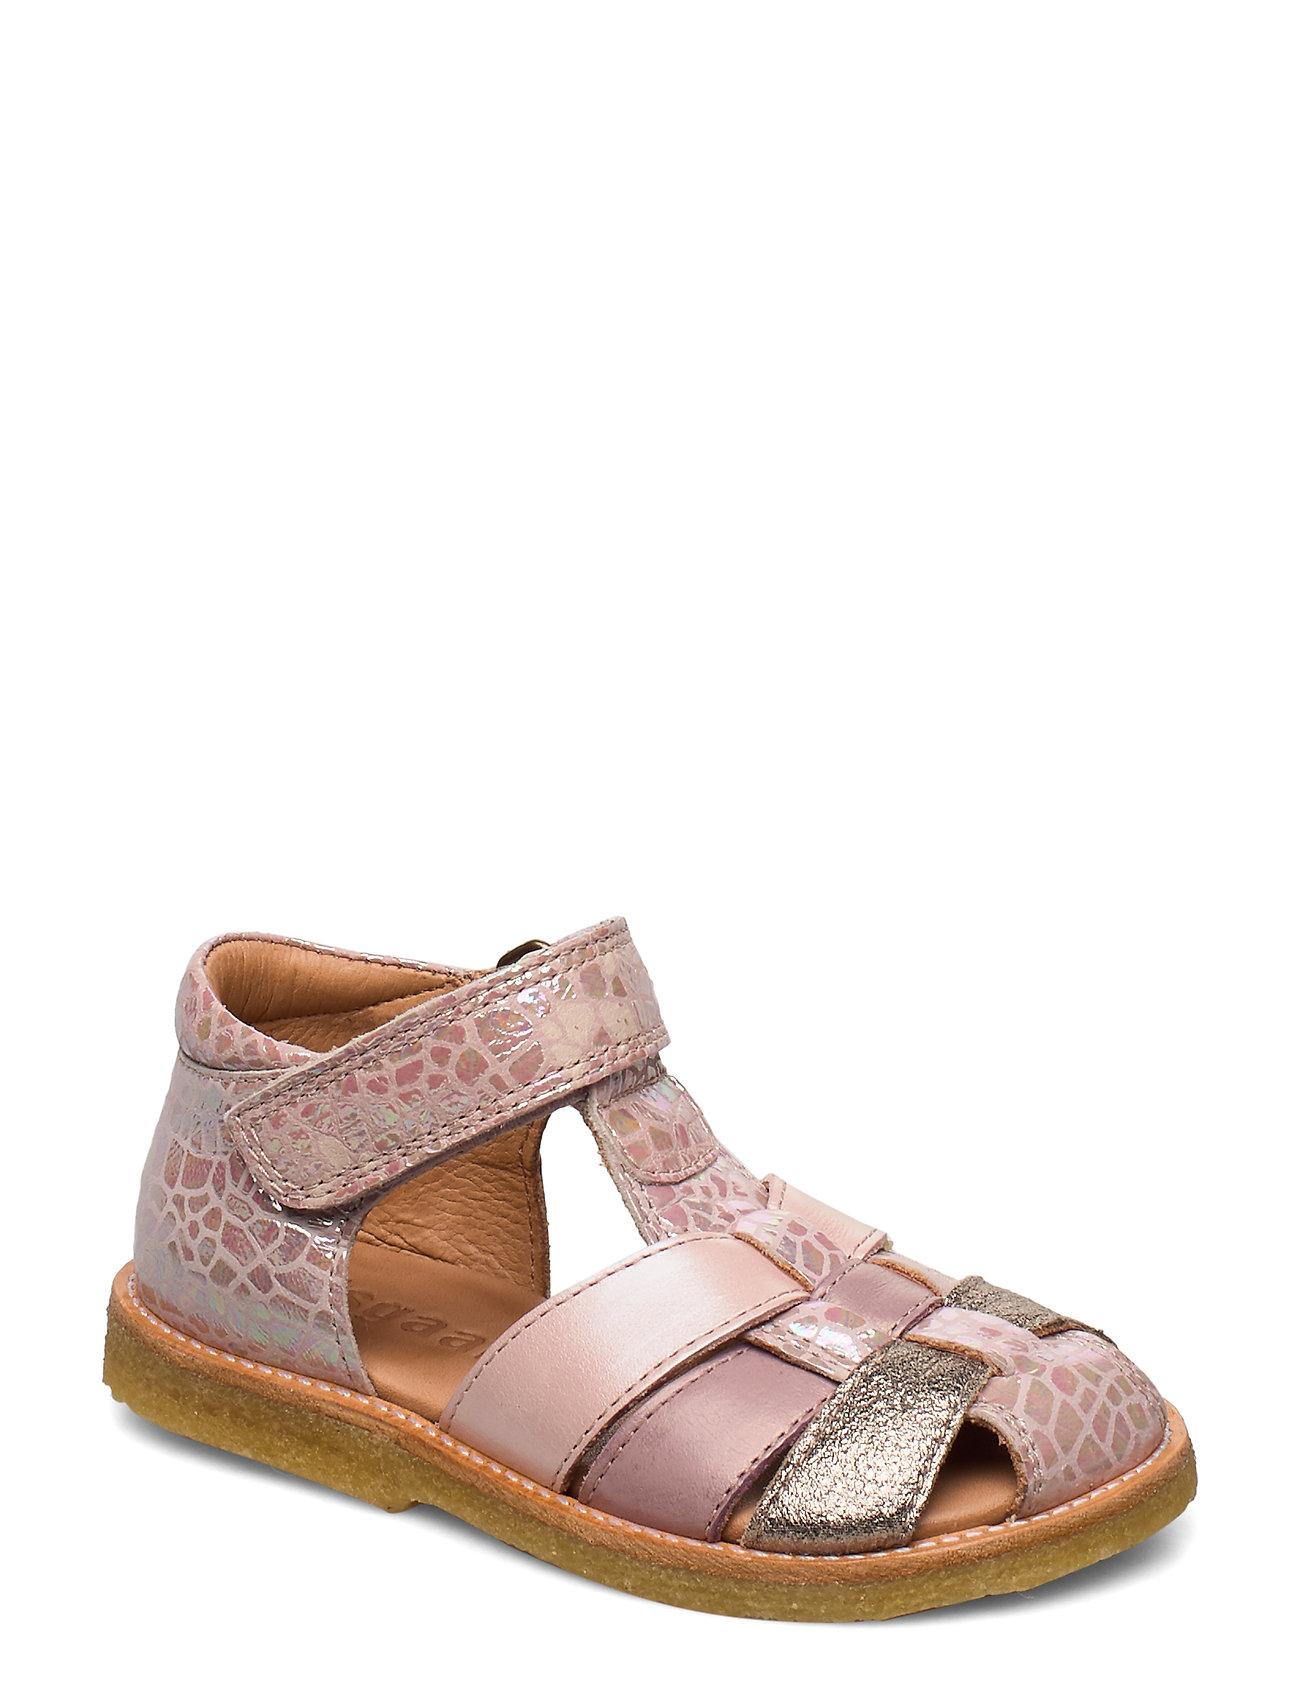 Sandals Shoes Summer Shoes Sandals Beige Bisgaard